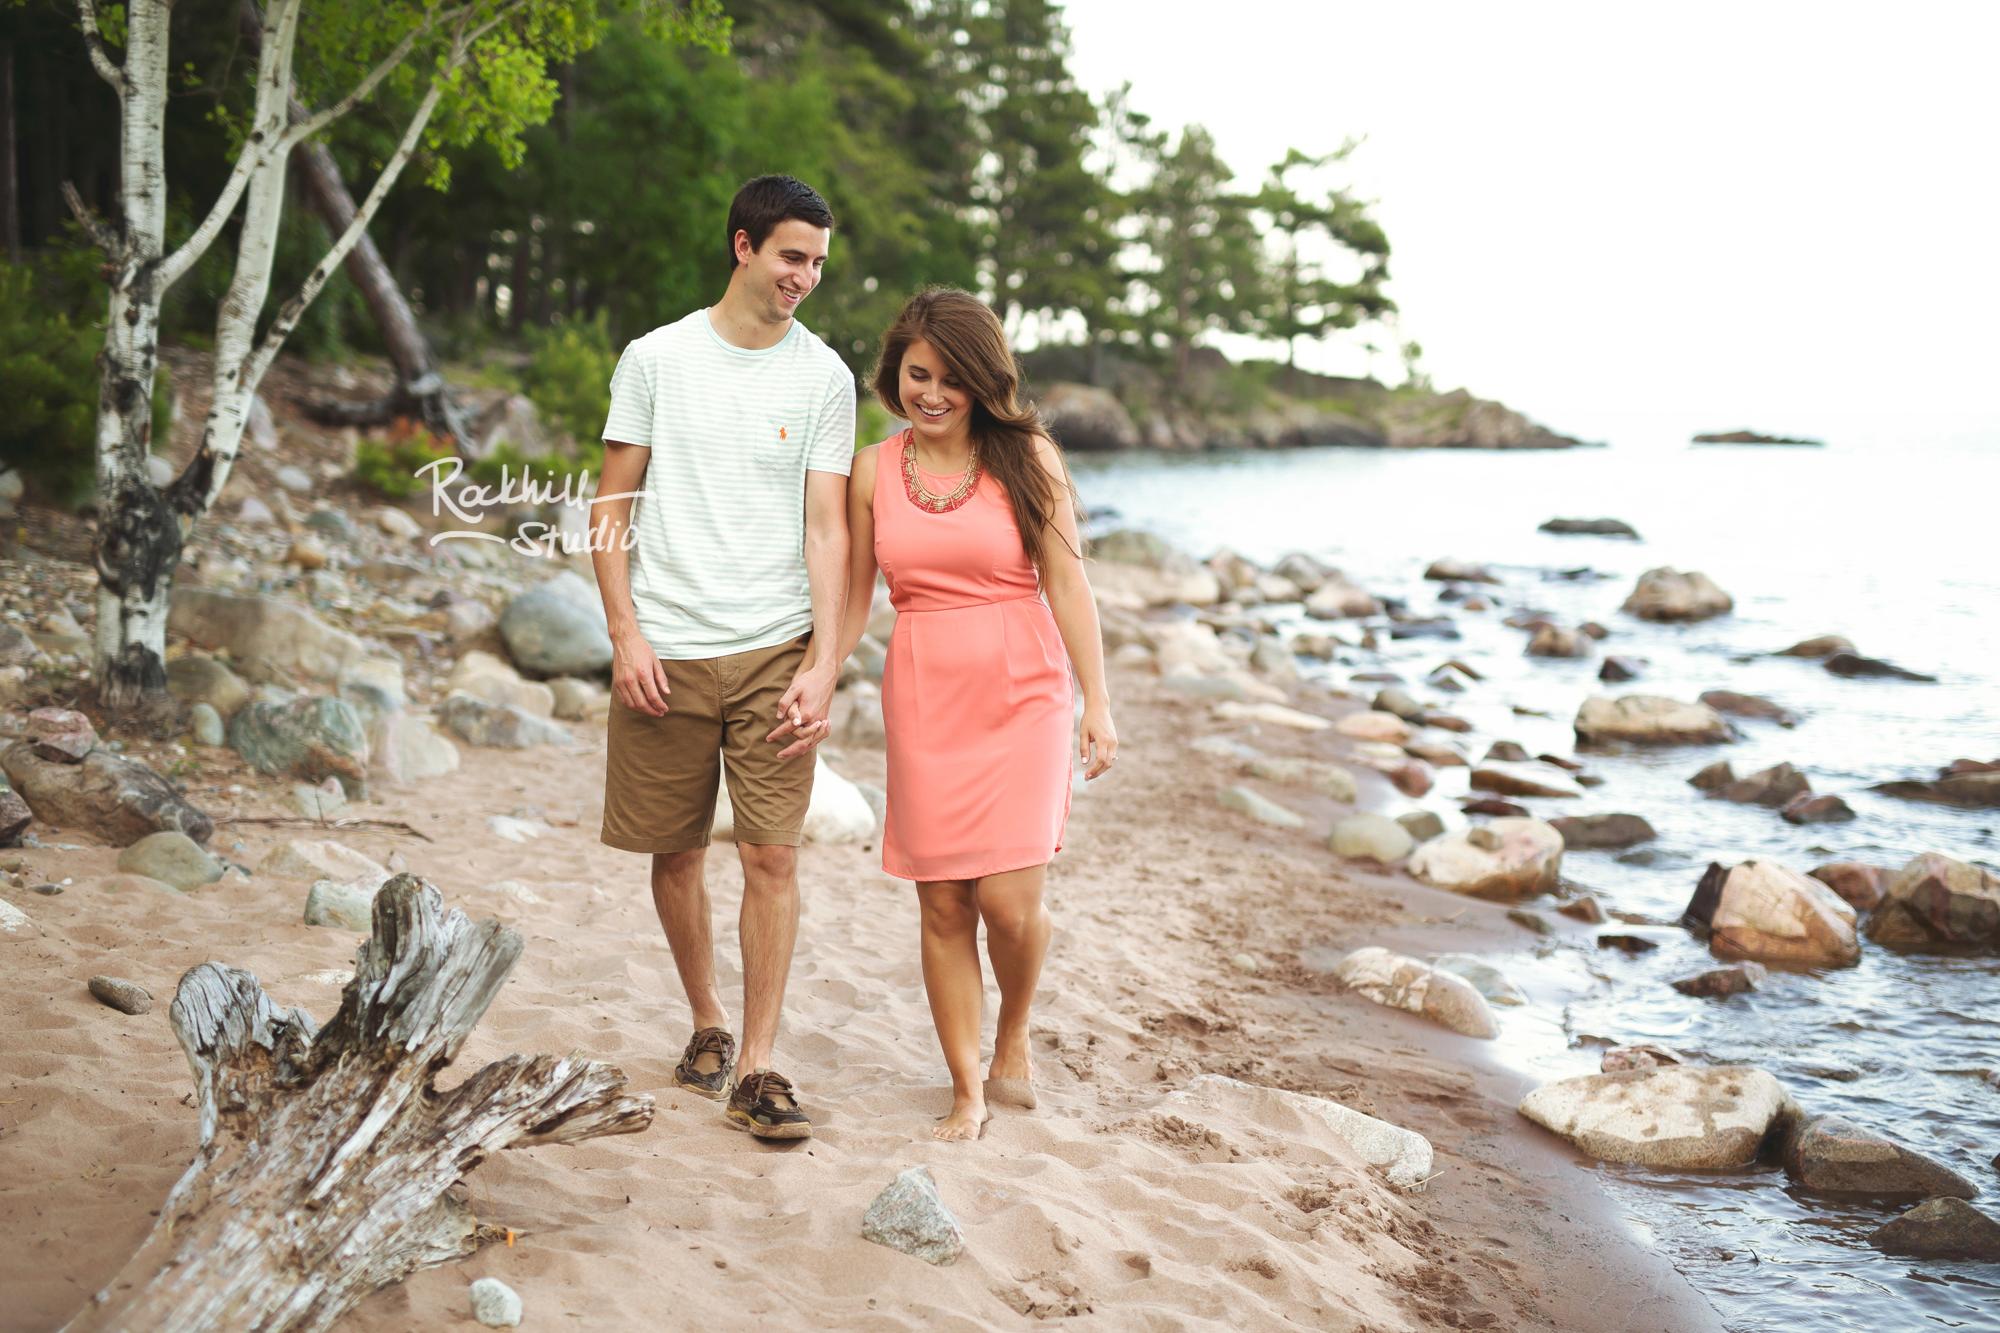 rockhill-studio-marquette-michigan-upper-peninsula-engagement-photographer-wetmore-landing-lake-superior-wedding-30.jpg